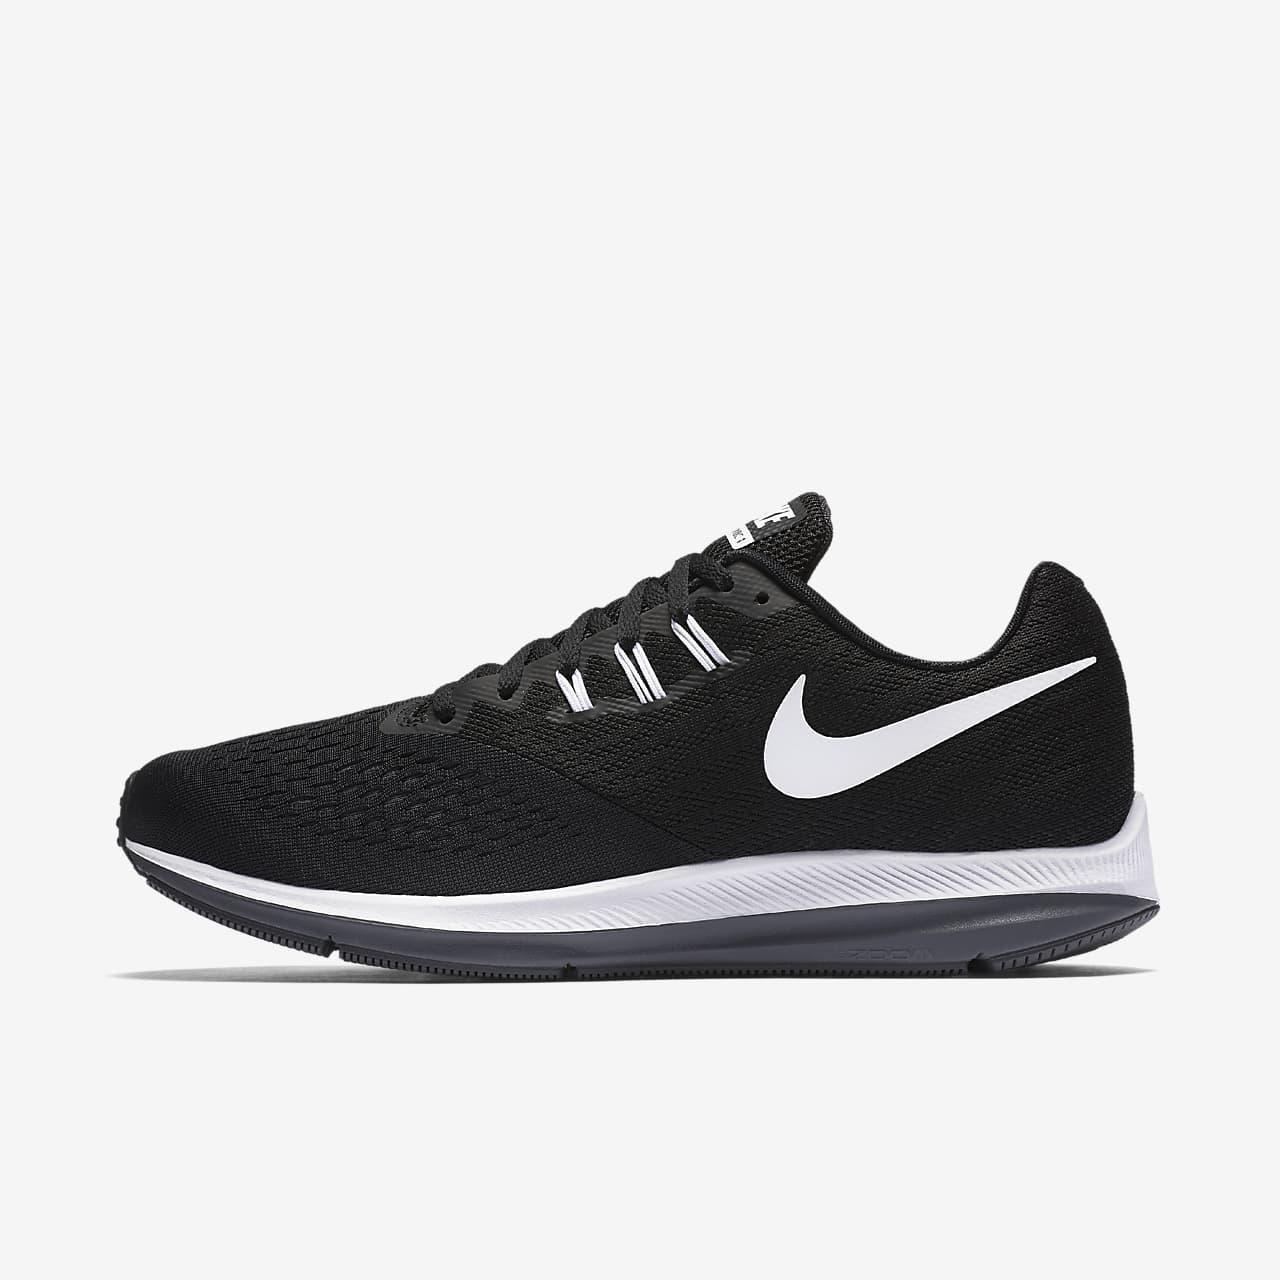 Nike Zoom Winflo 4 Men's Running Shoe